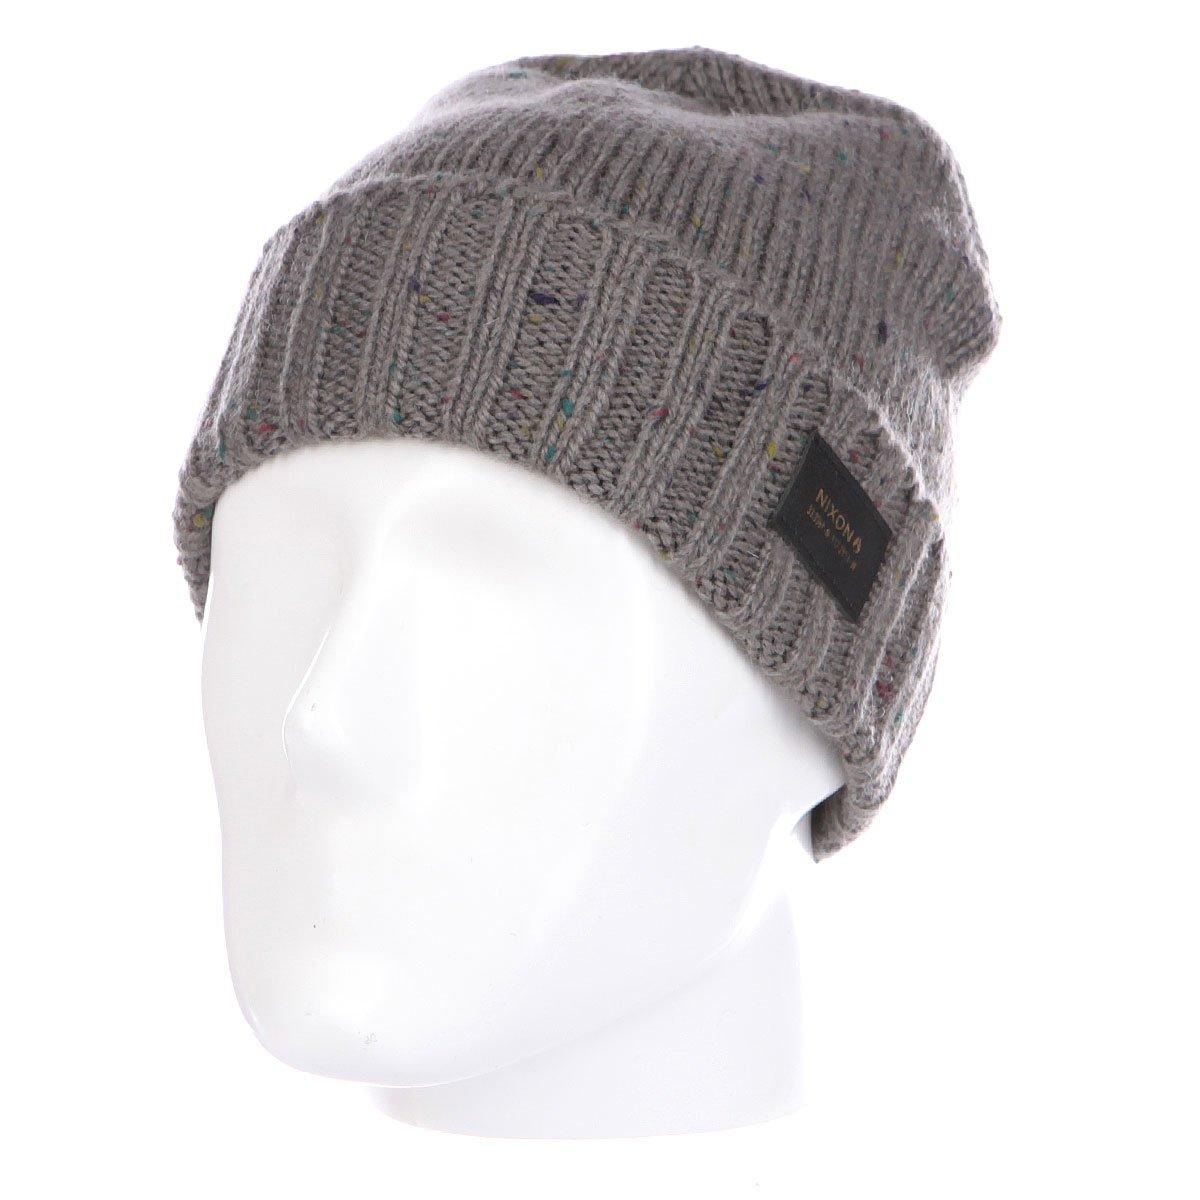 61111e6da2820 Купить шапку Nixon Kemble Beanie Charcoal в интернет-магазине ...